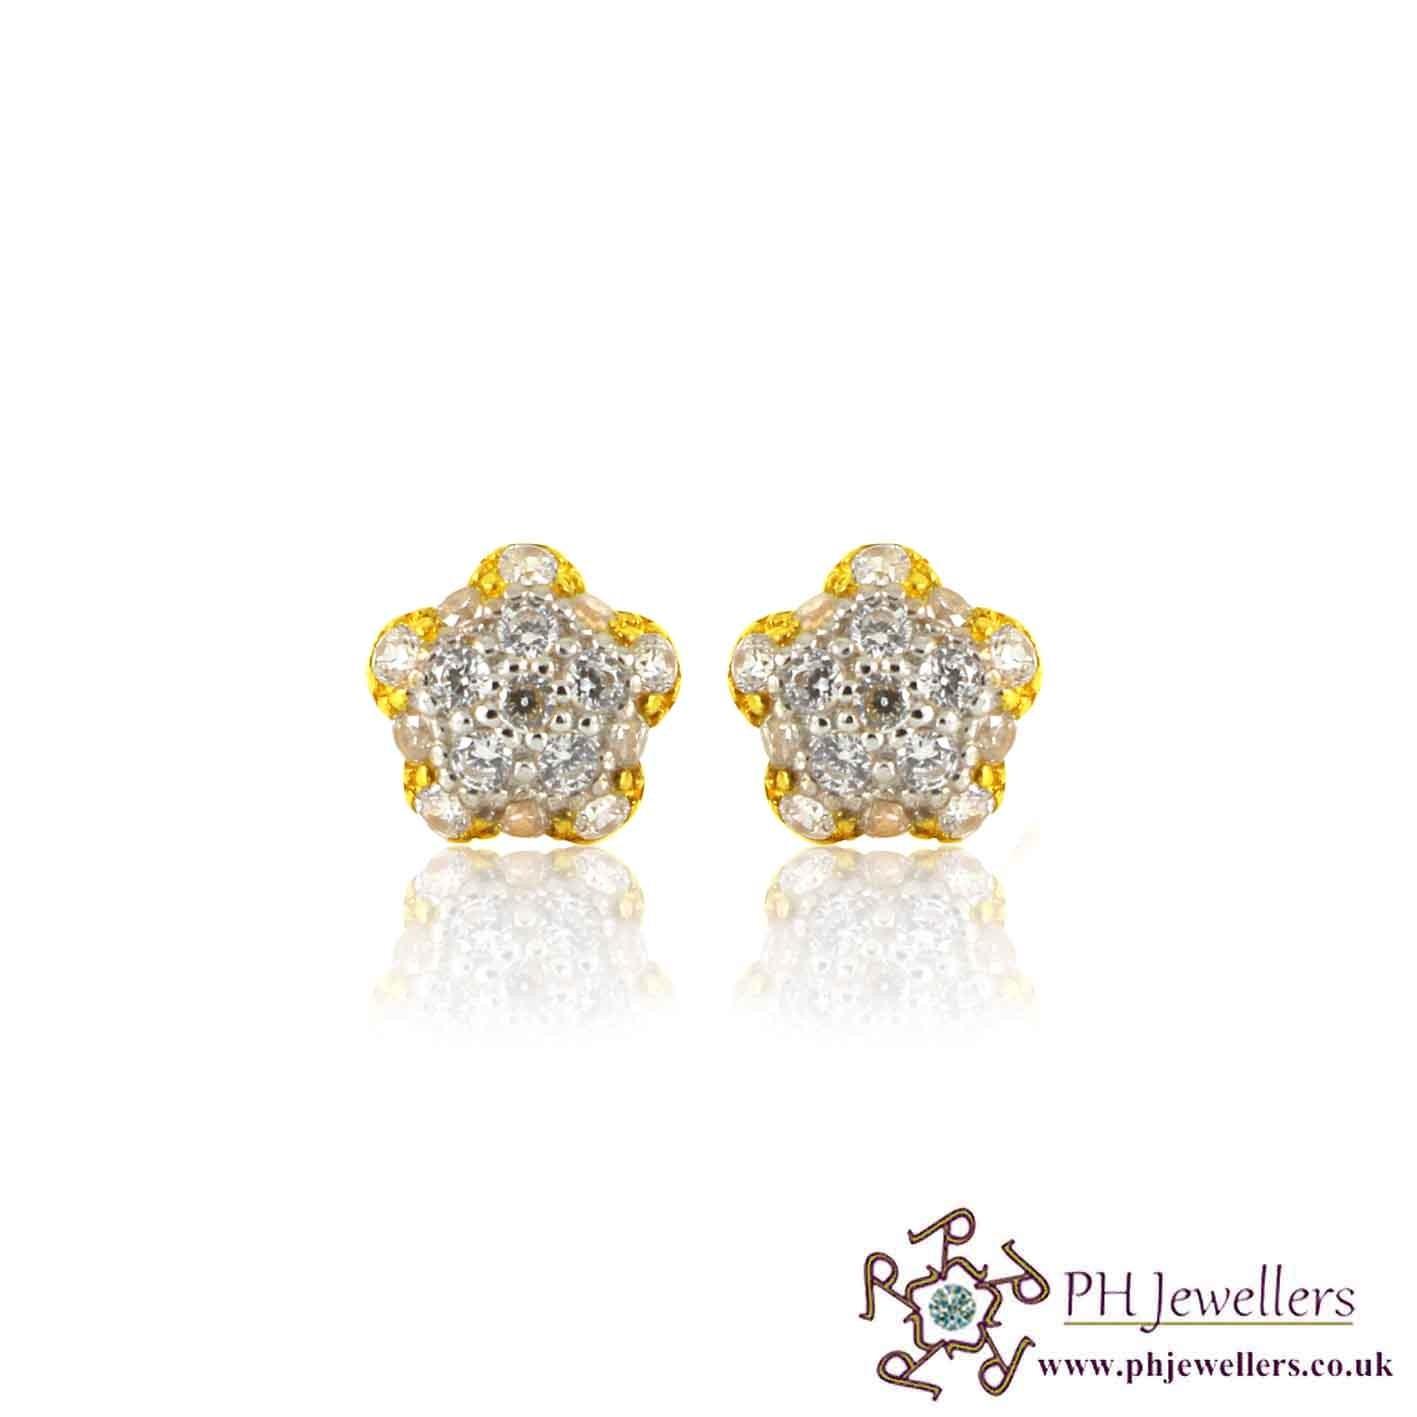 22ct 916 Yellow Gold Stud Rhodium Earring CZ SE35